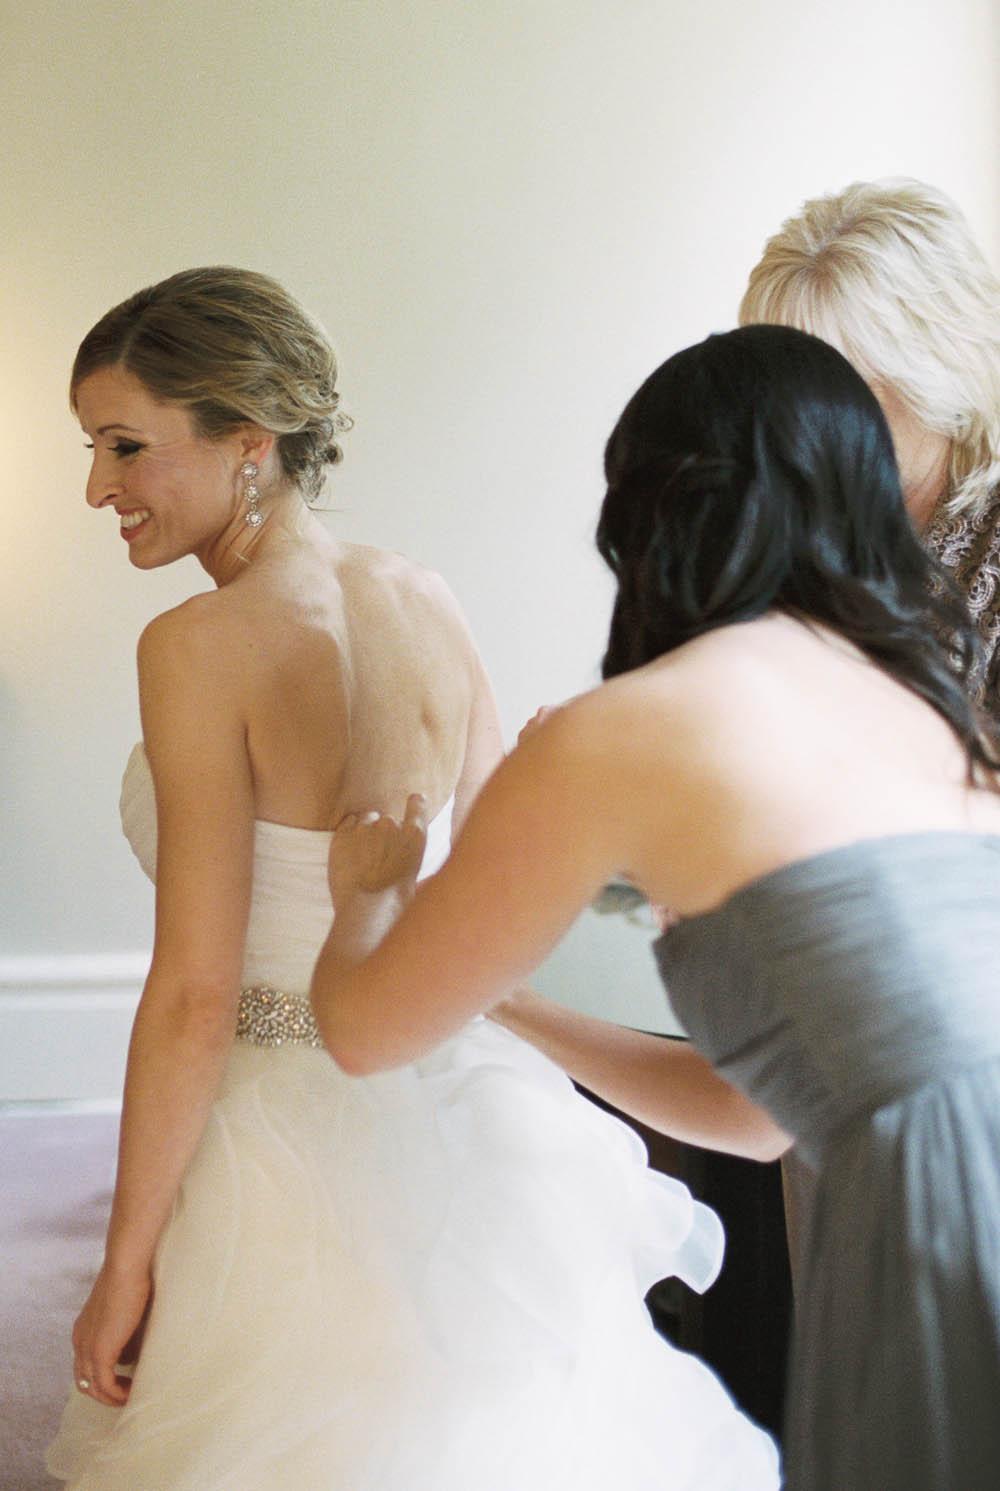 riverwood mansion film wedding photographer natural documentary ©2016abigailbobophotography-8.jpg